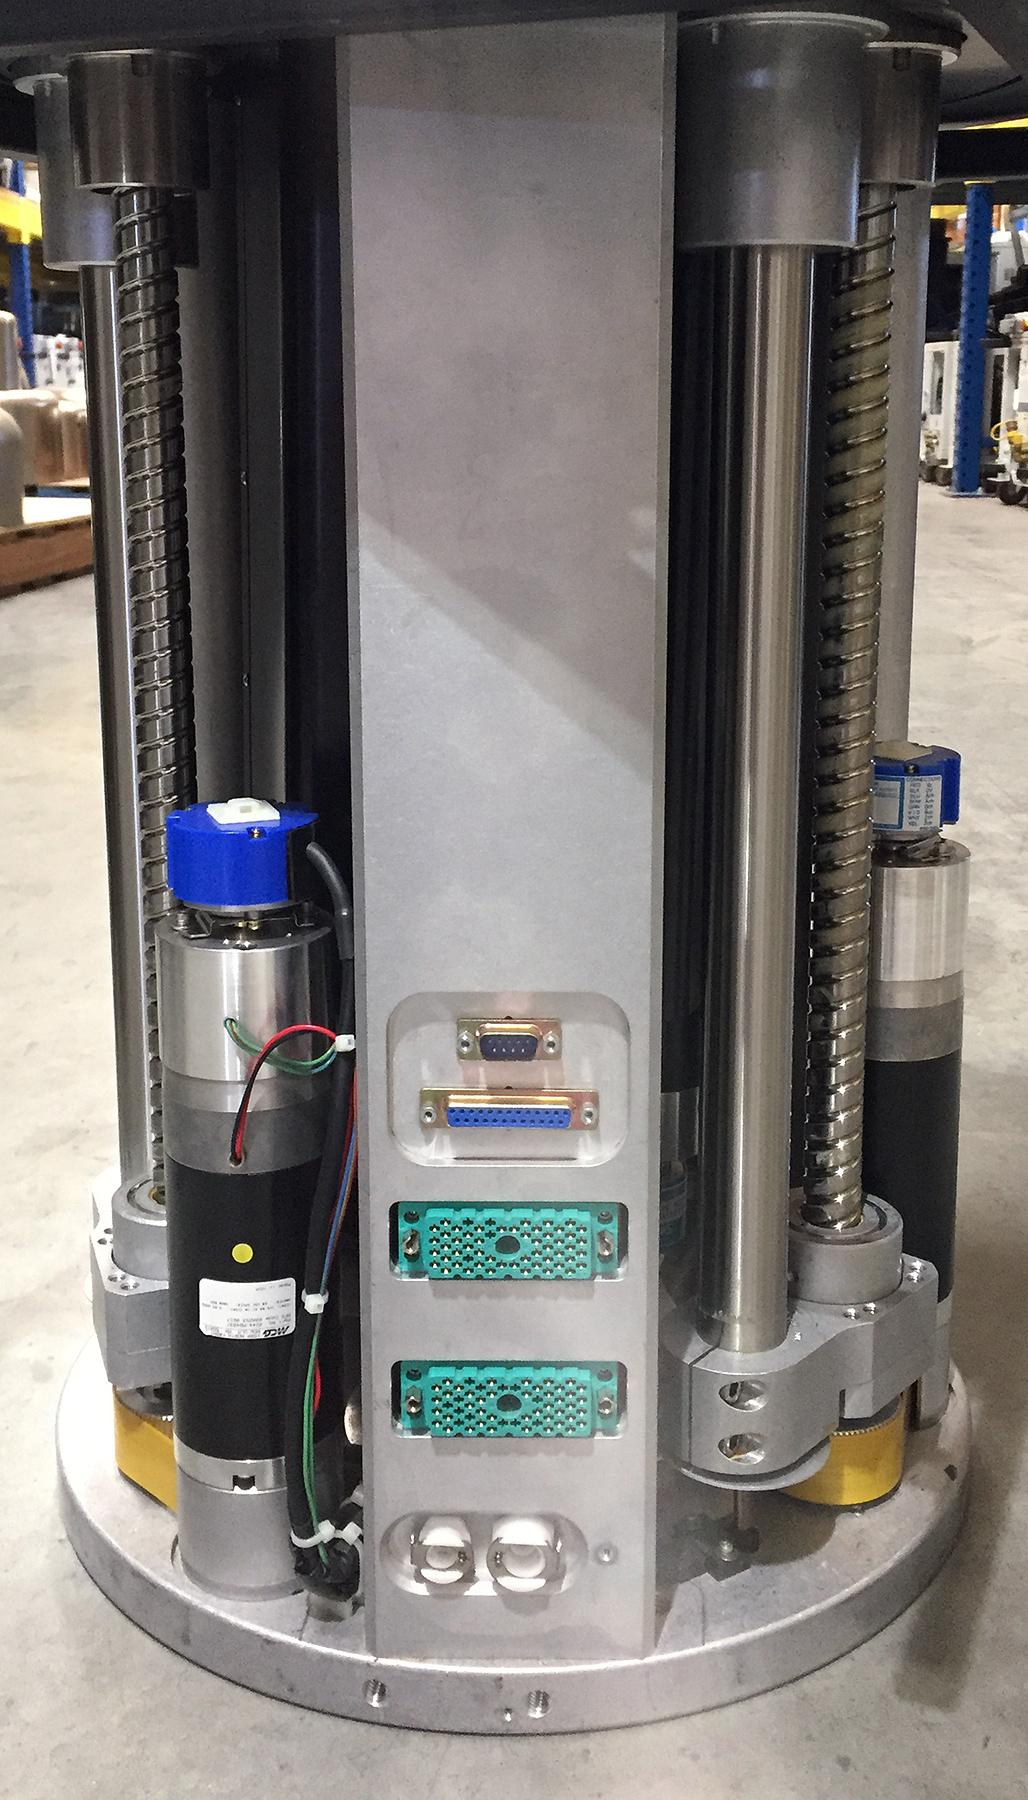 Genmark Automation GENCOBOT GB8 Wafer Handling Robot